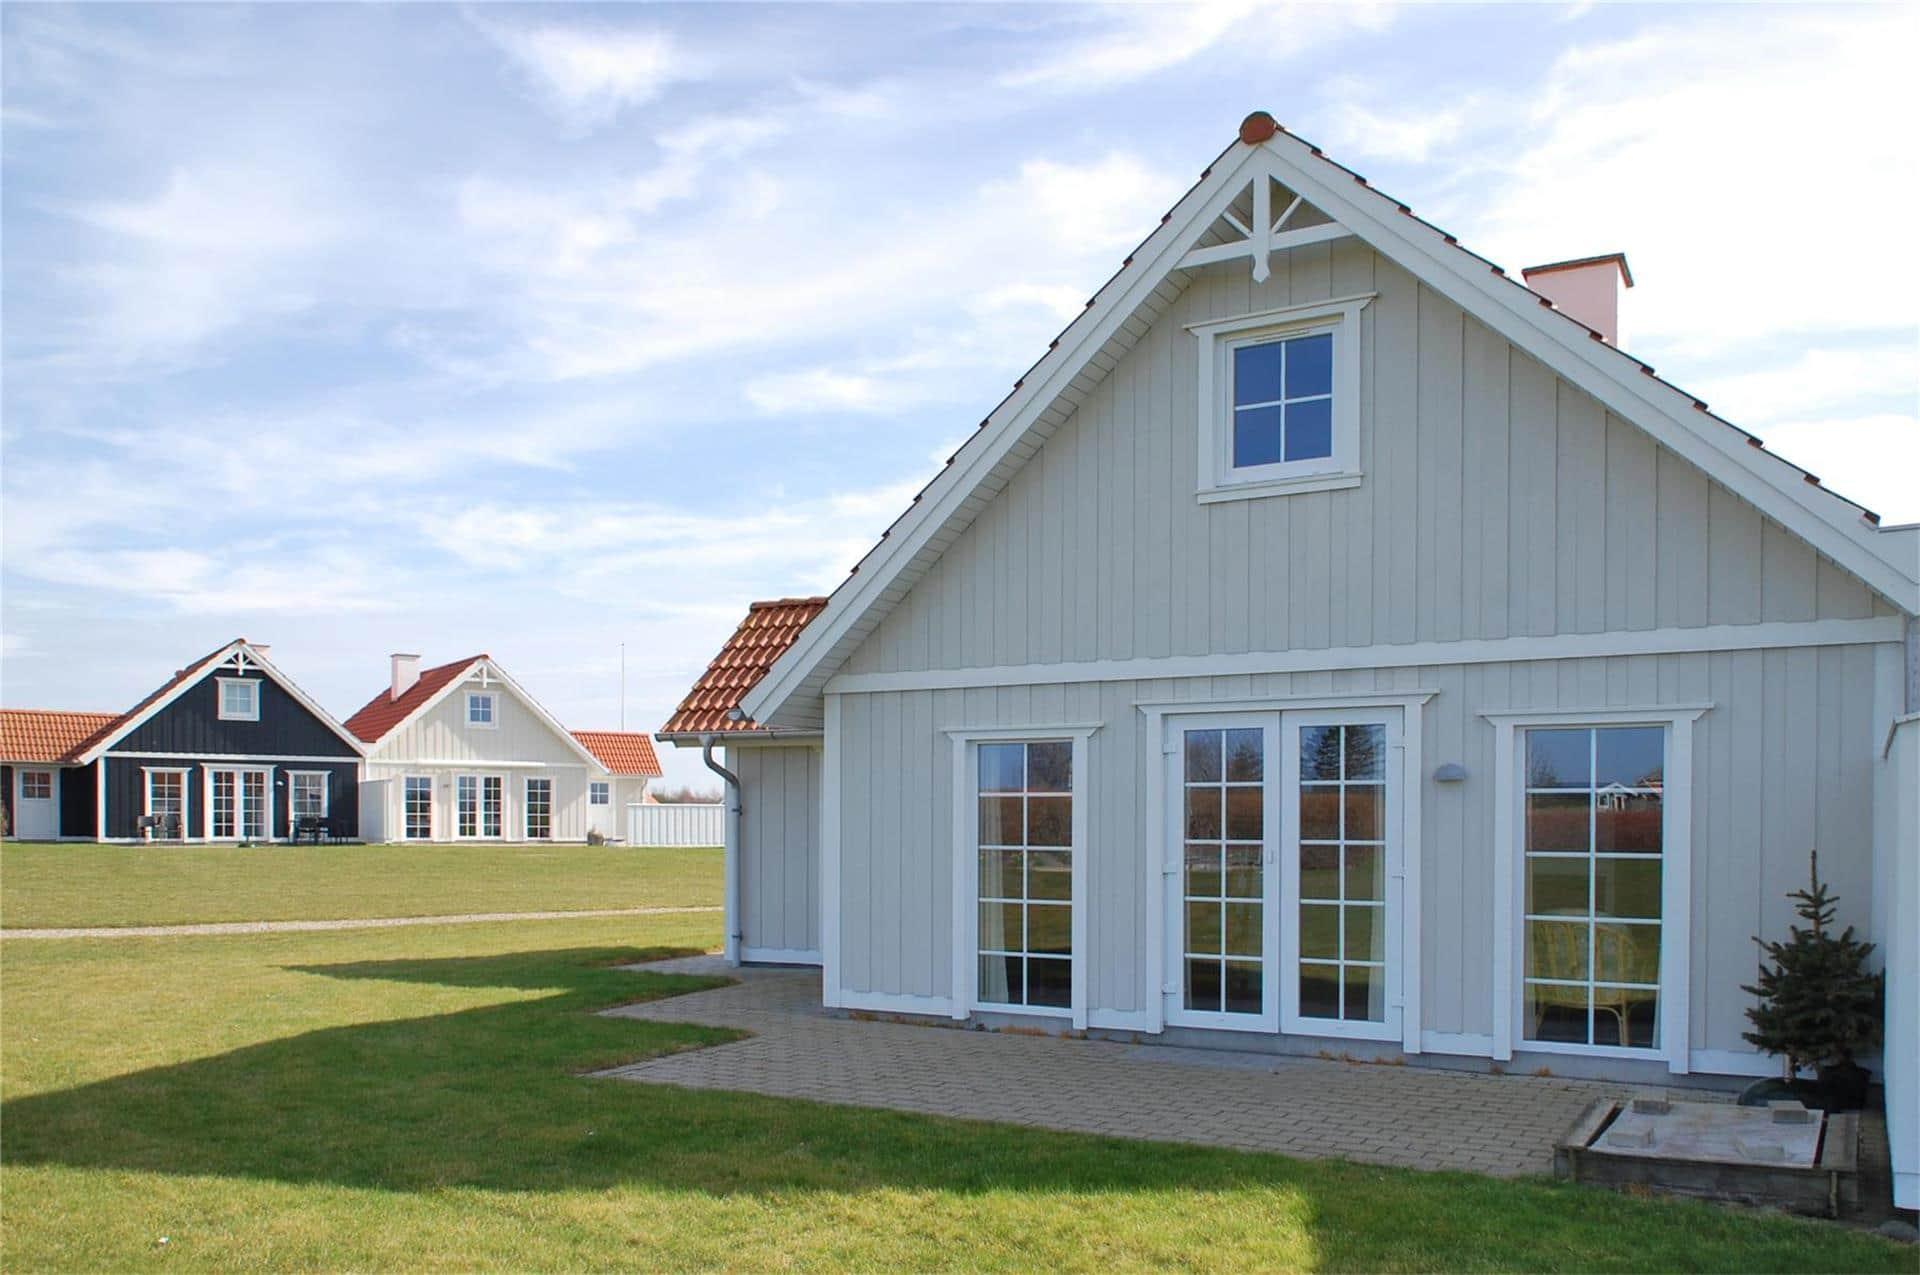 Bild 1-3 Stuga M64352, Strandgårdsvej 193, DK - 5464 Brenderup Fyn